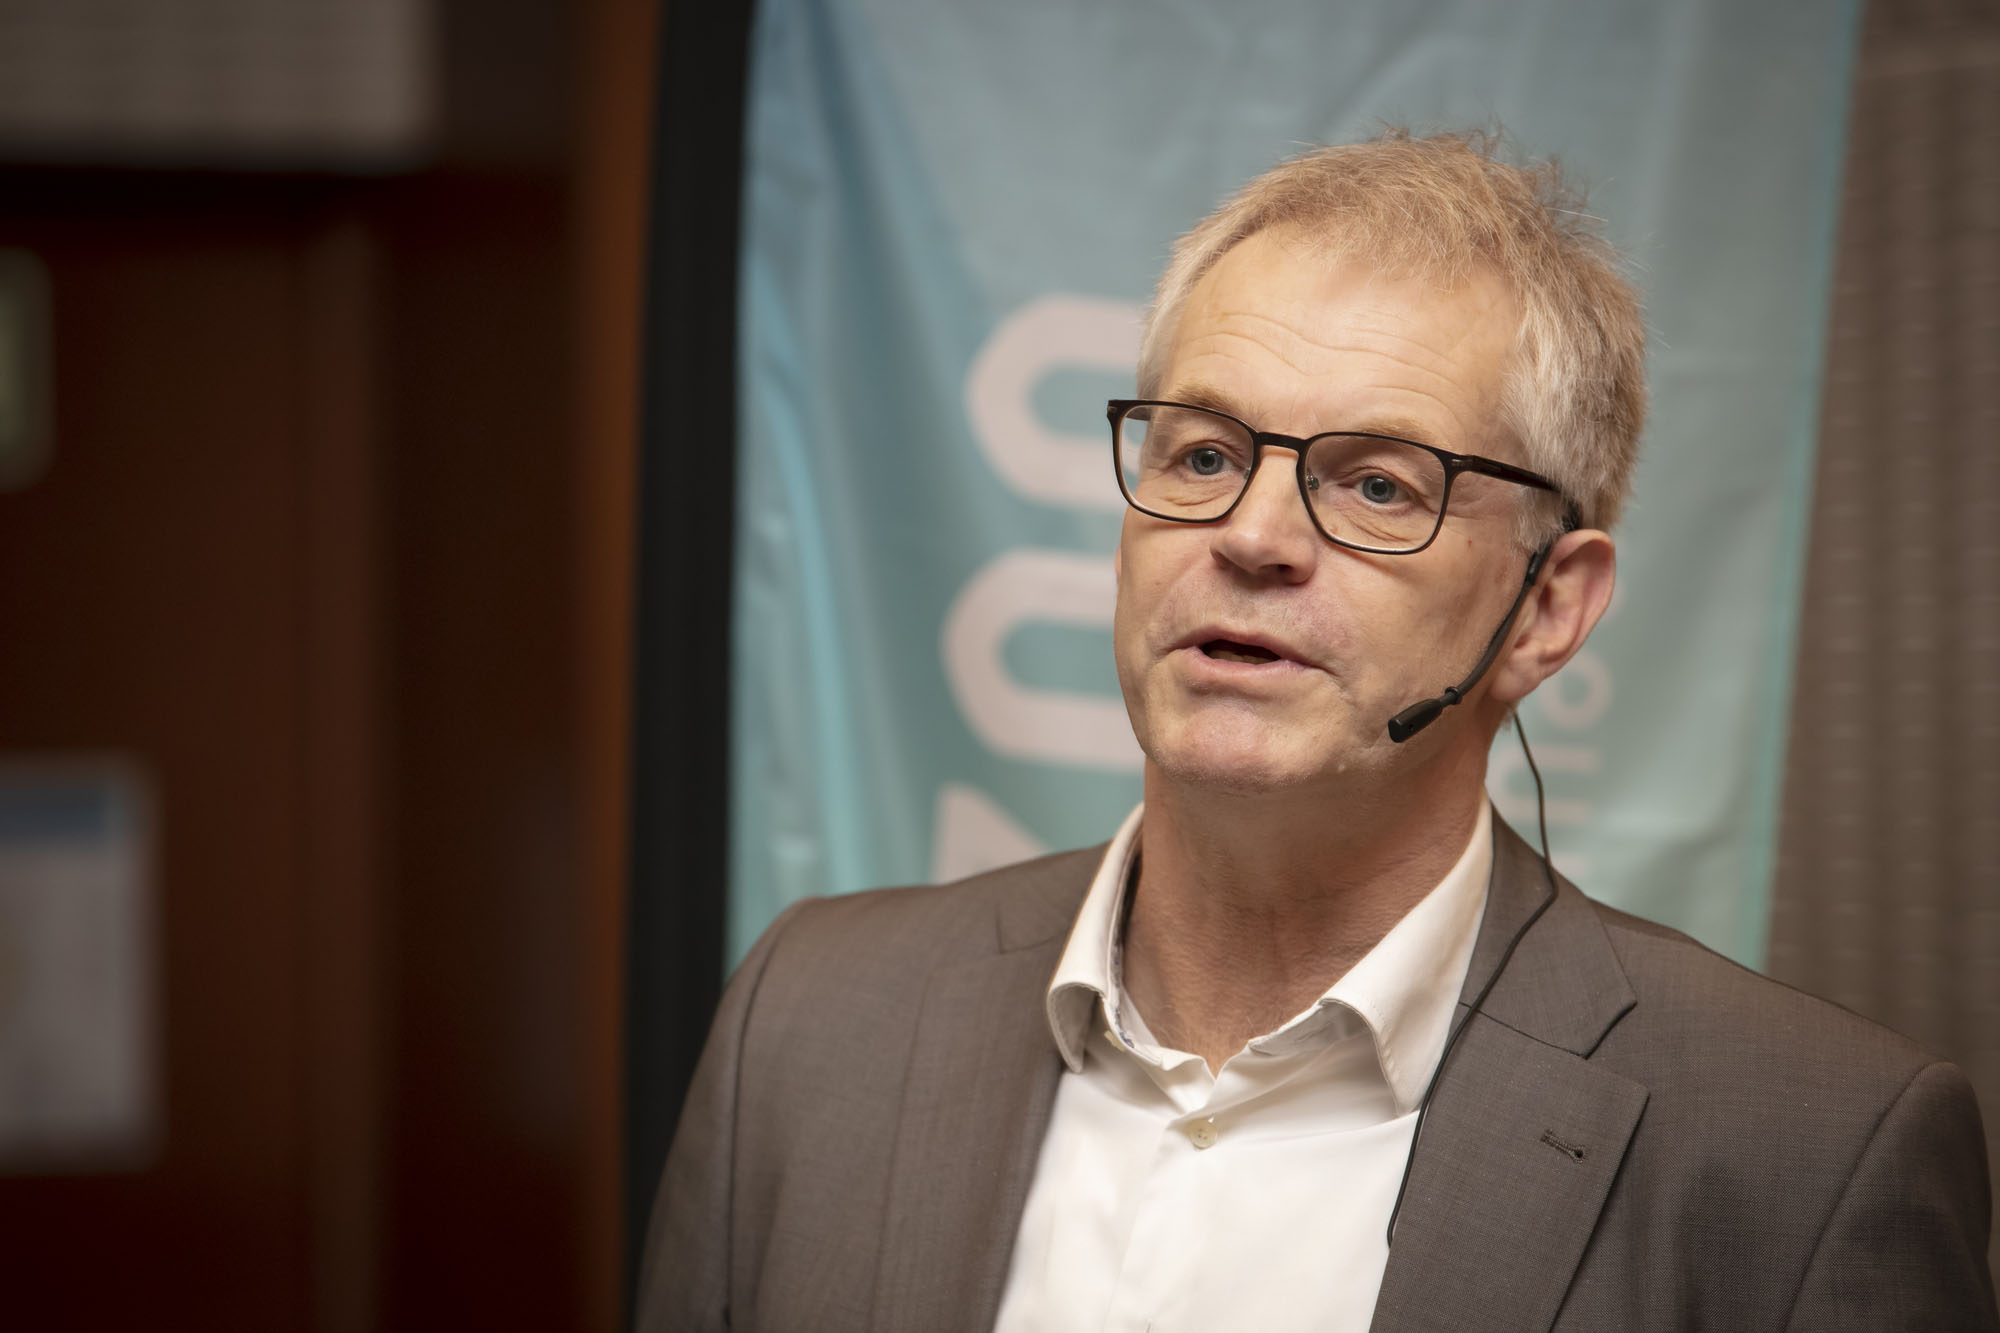 Pieter Imhof